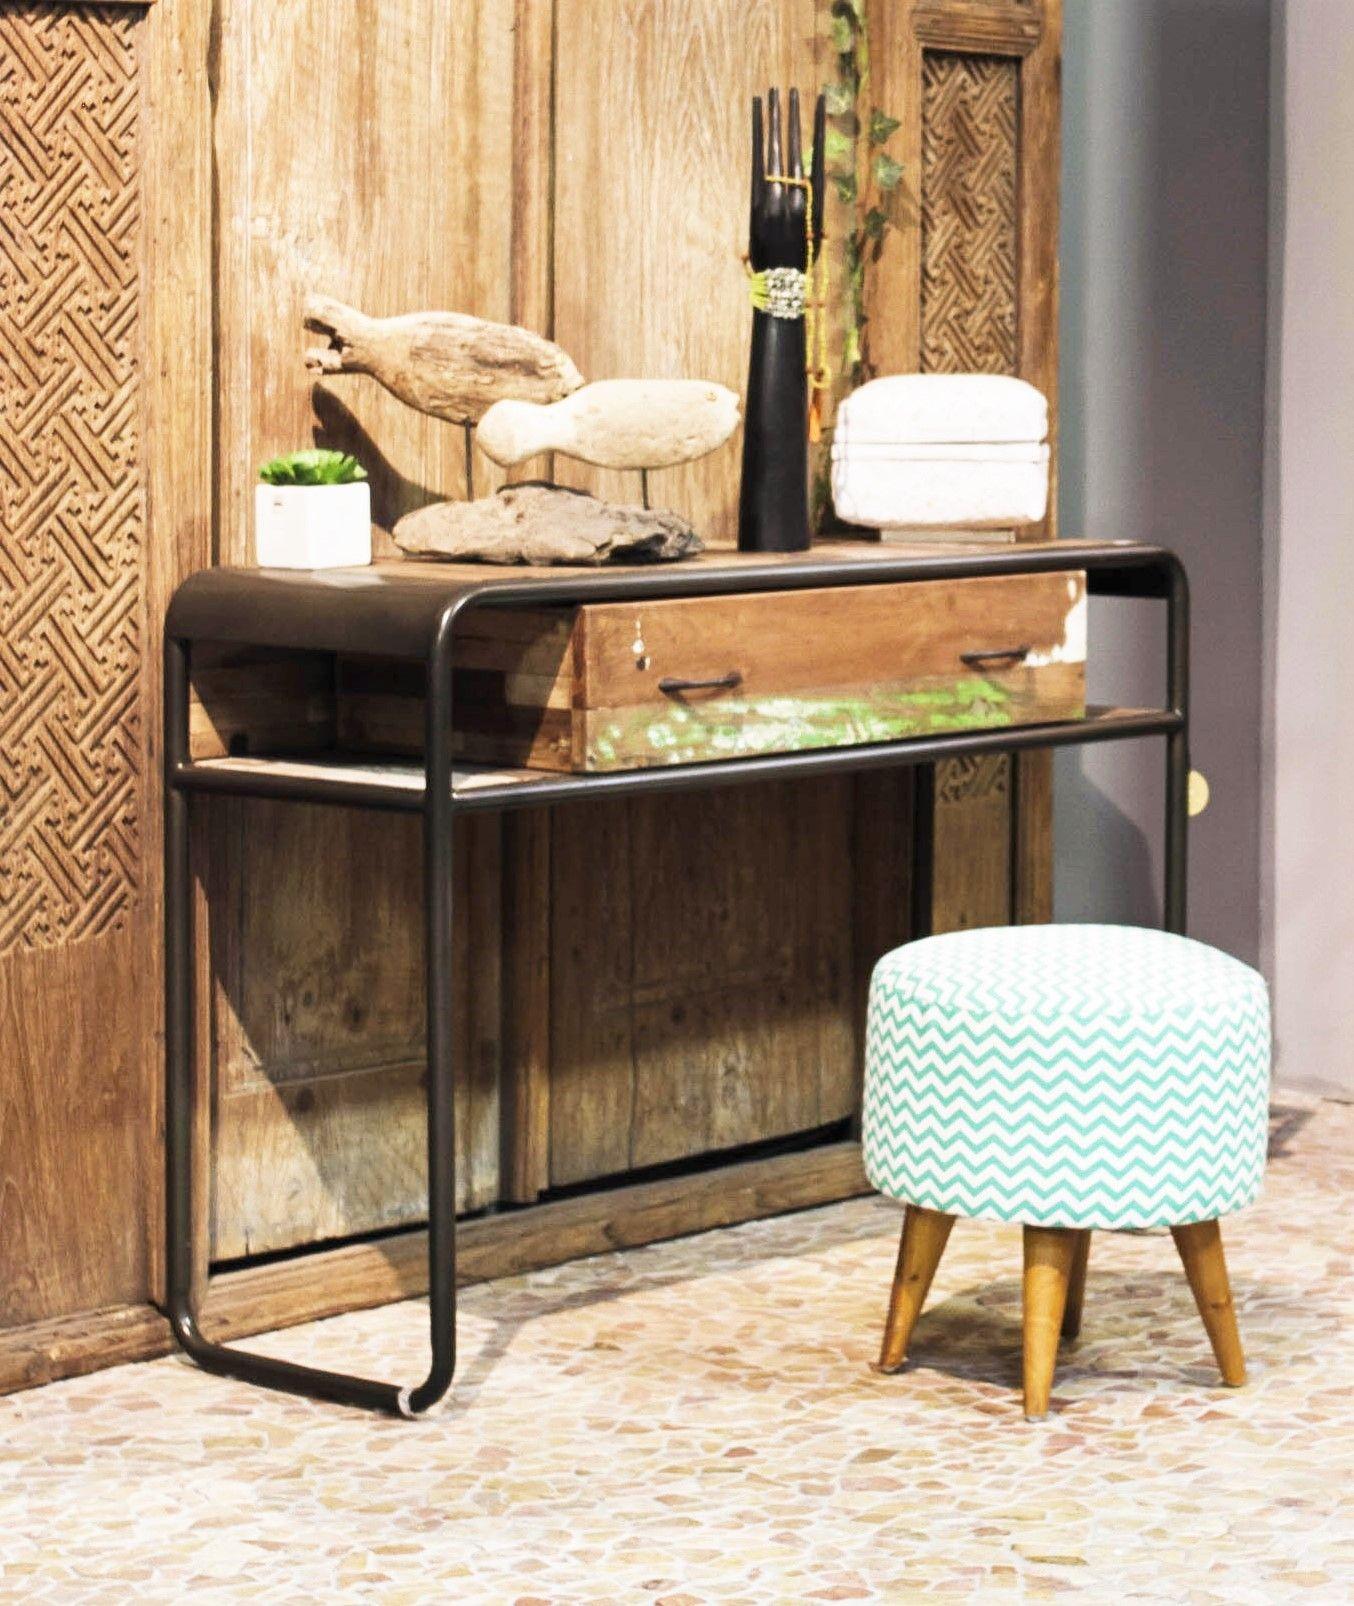 meuble vintage bois et fer meuble design industriel fer bois - Meuble Design Vintage